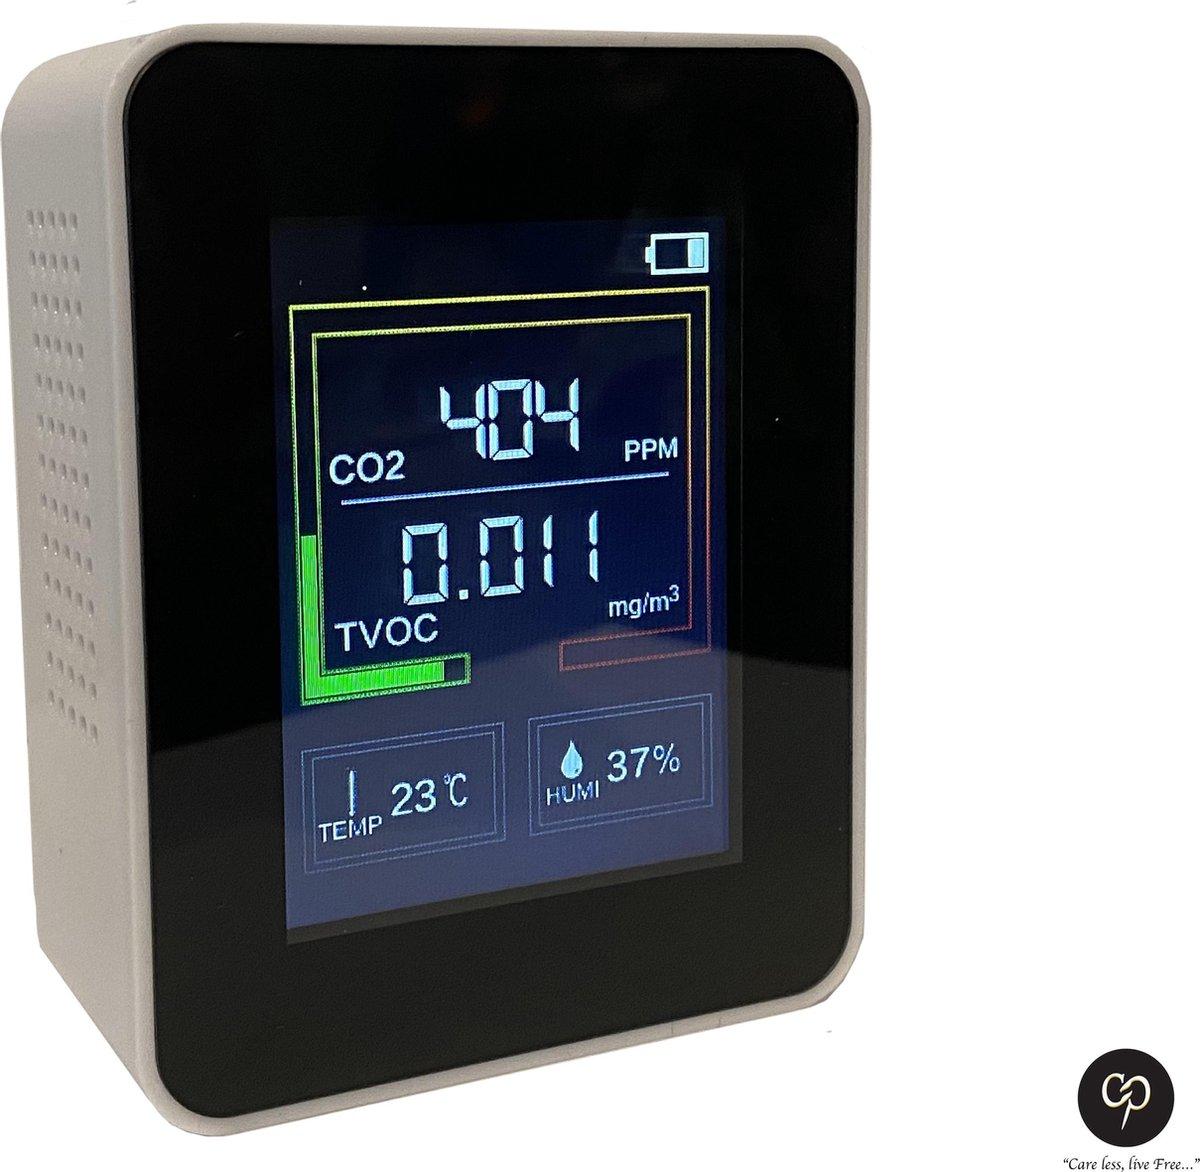 Carefree CO2 Meter - CO2 Meter Horeca - Luchtkwaliteitsmeter - Temperatuurmeter - CO2 meter binnen -